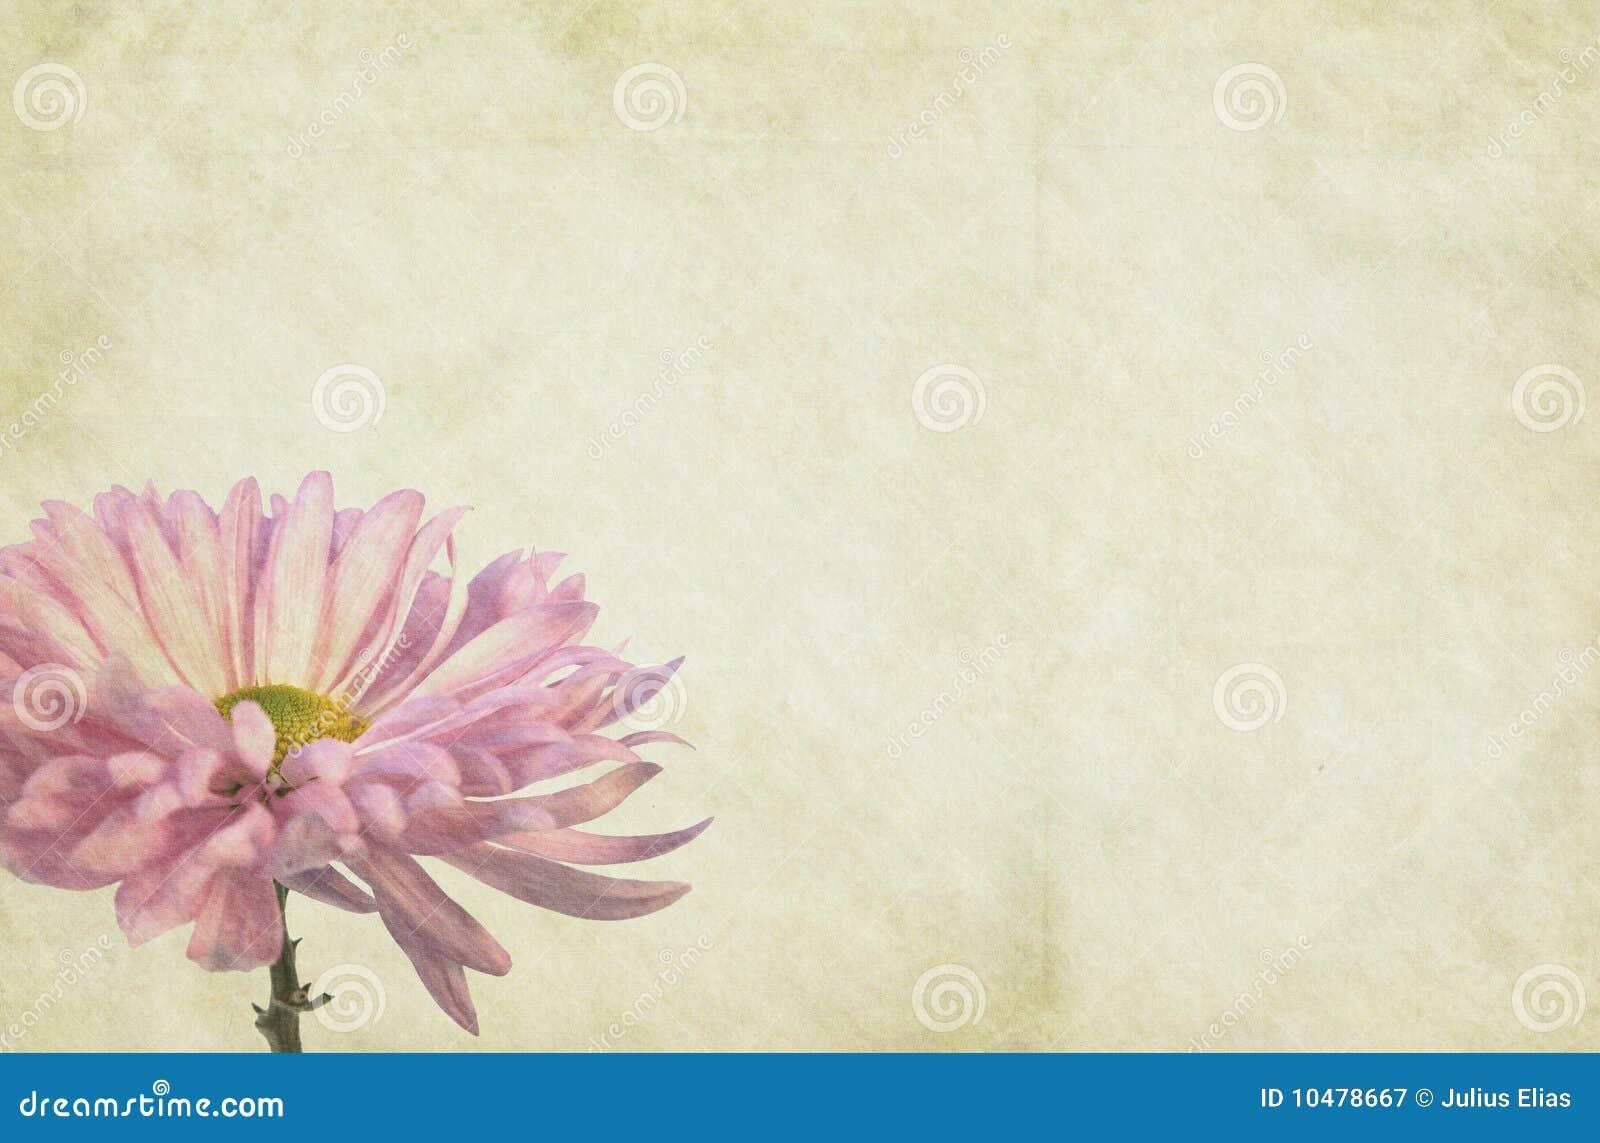 Flower Themed Paper Background Stock Illustration Illustration Of